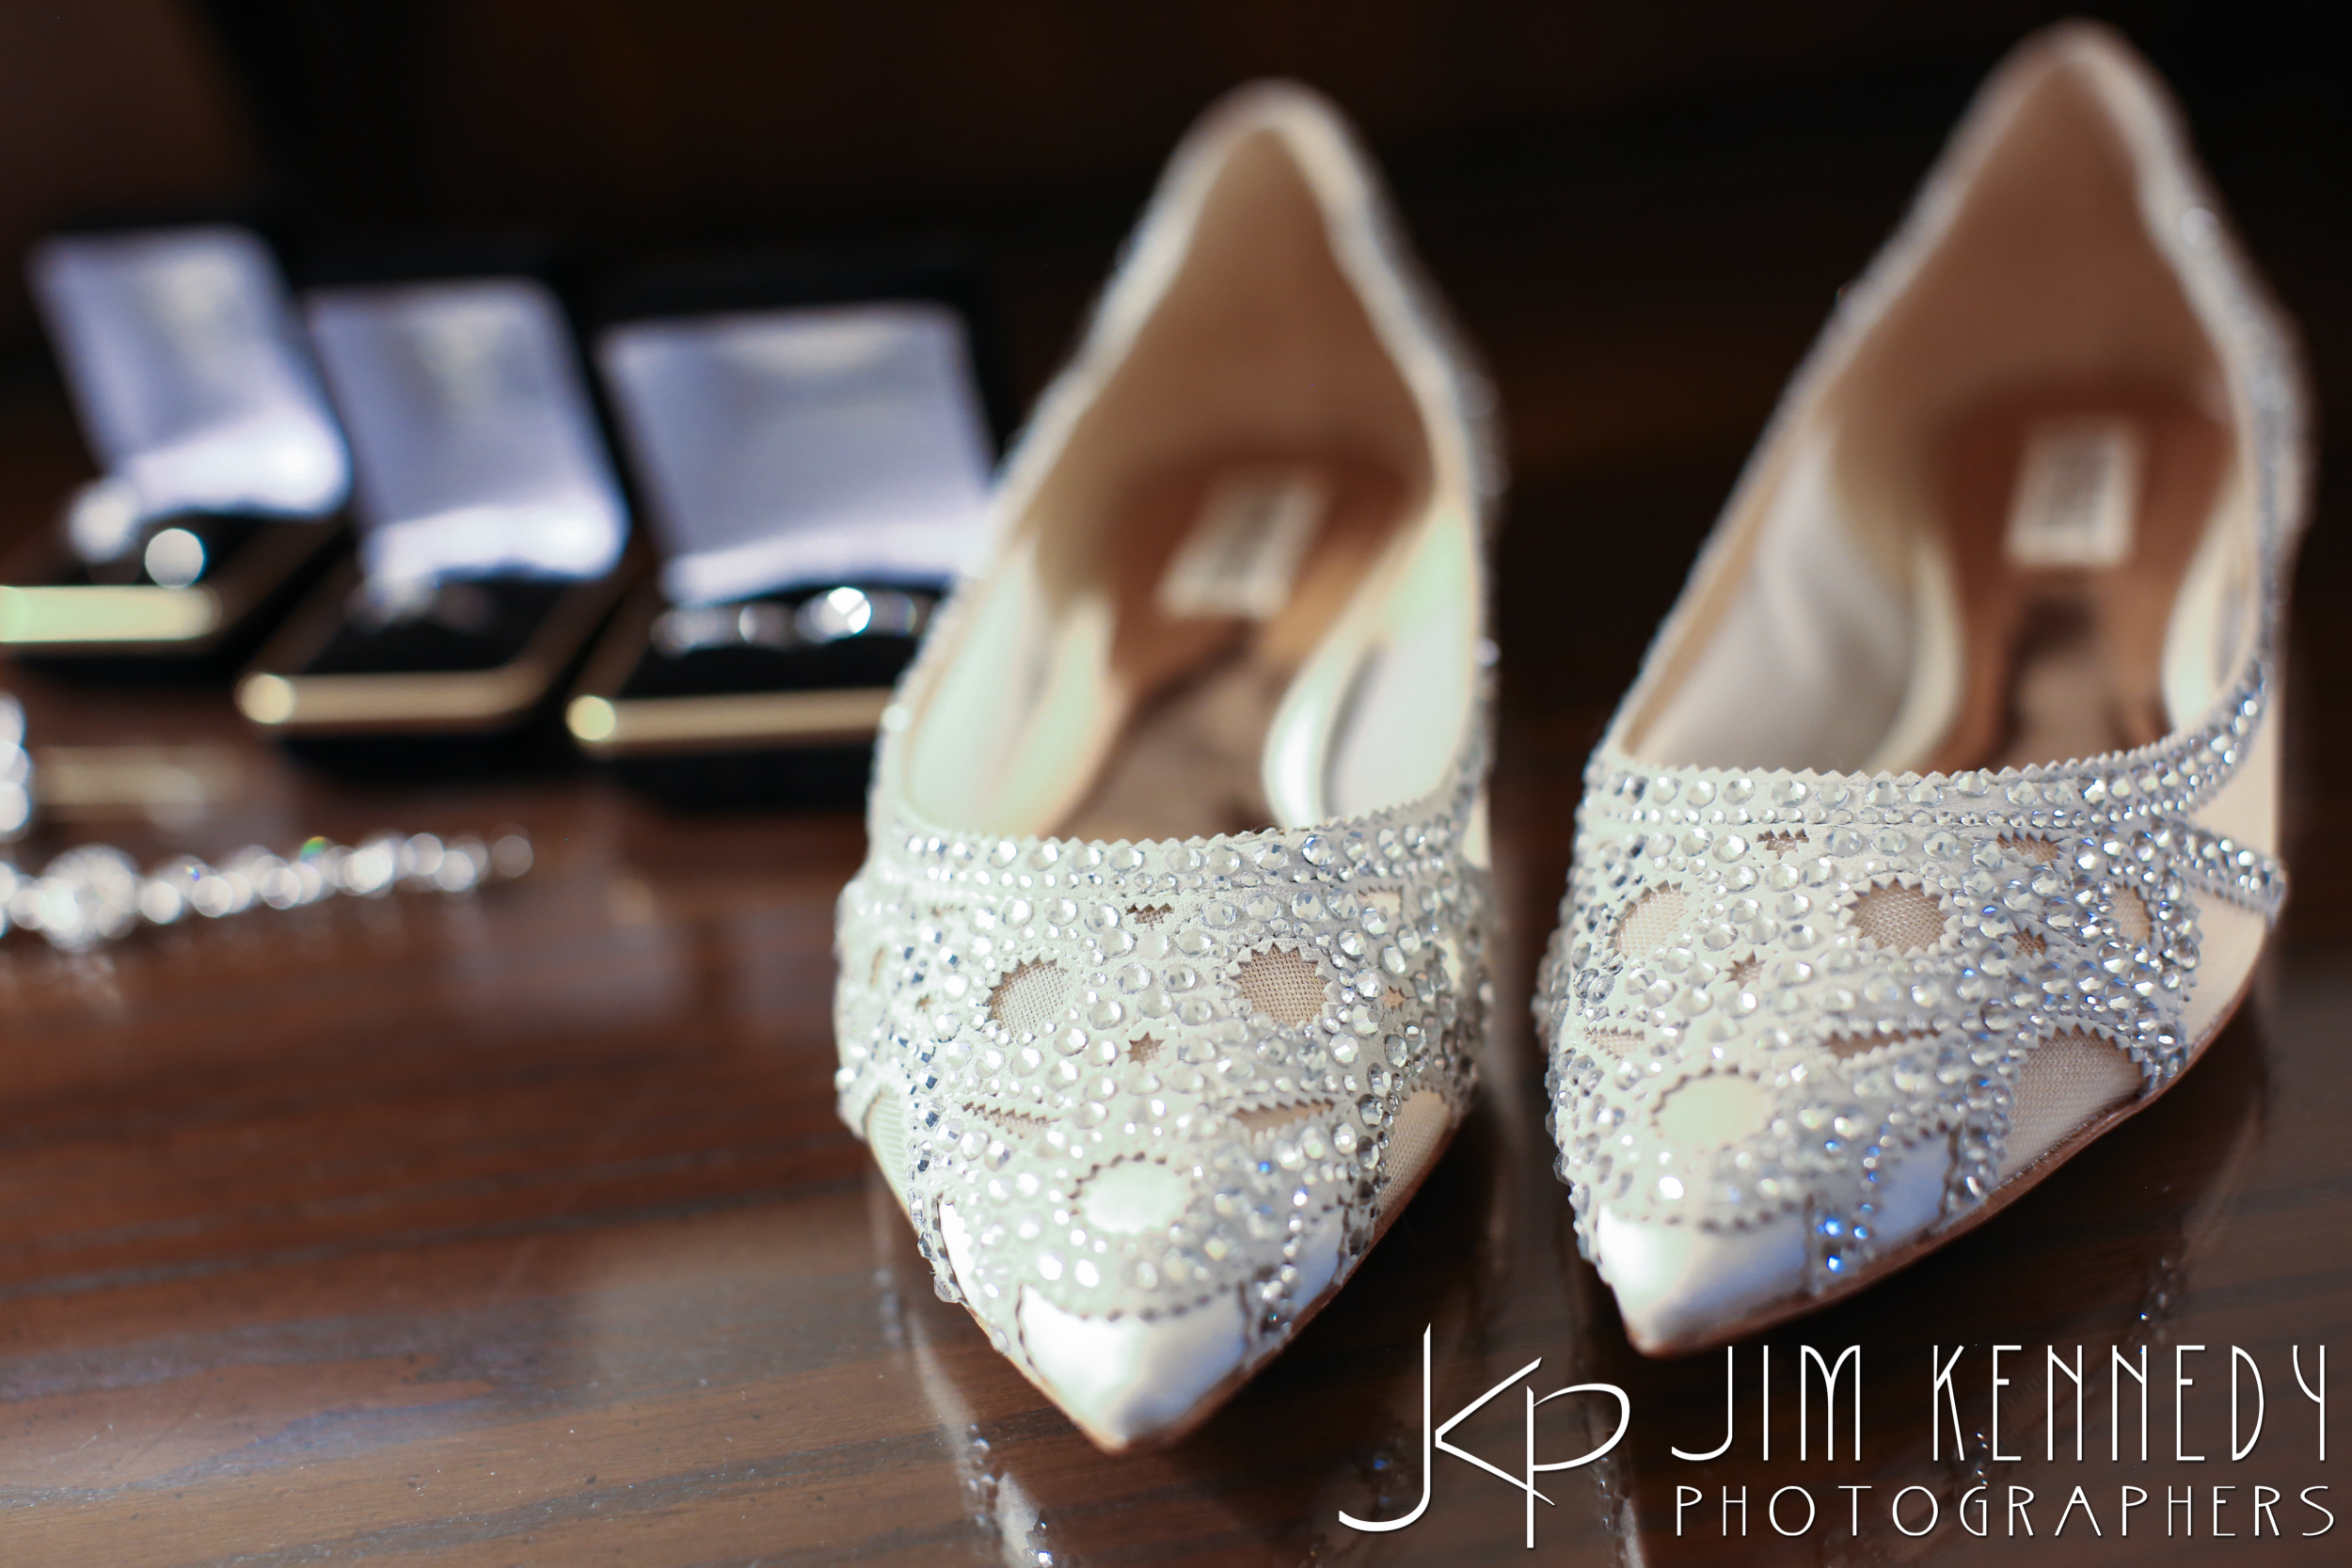 jim_kennedy_photographers_highland_springs_wedding_caitlyn_0008.jpg